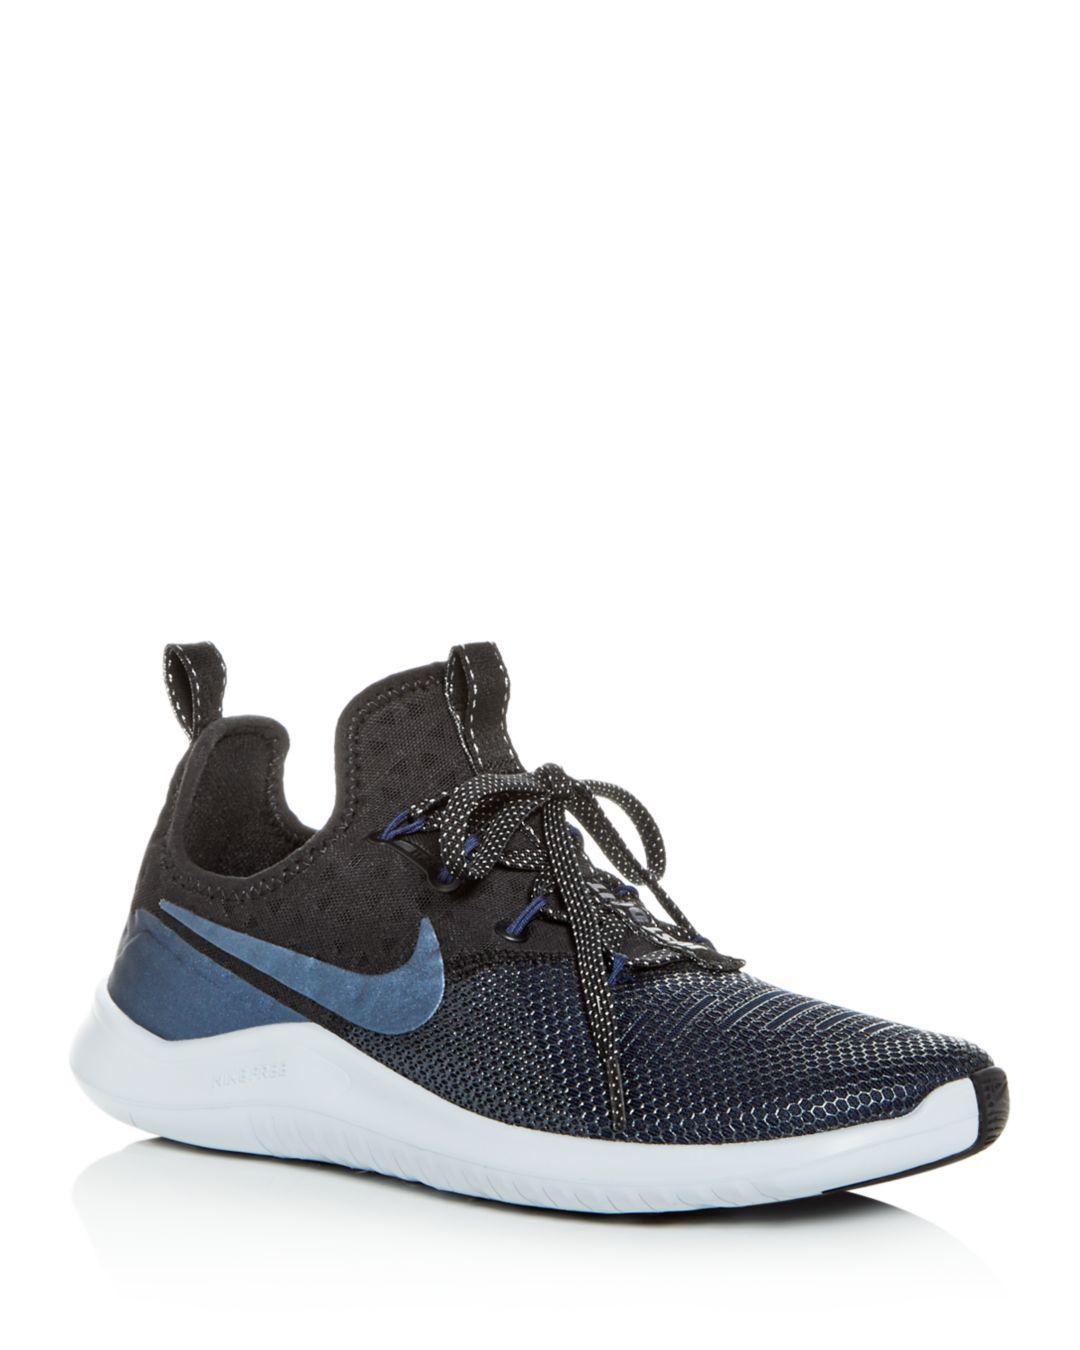 Lyst - Nike Women s Free Tr 8 Low-top Sneakers in Black - Save 25% bd7c98107